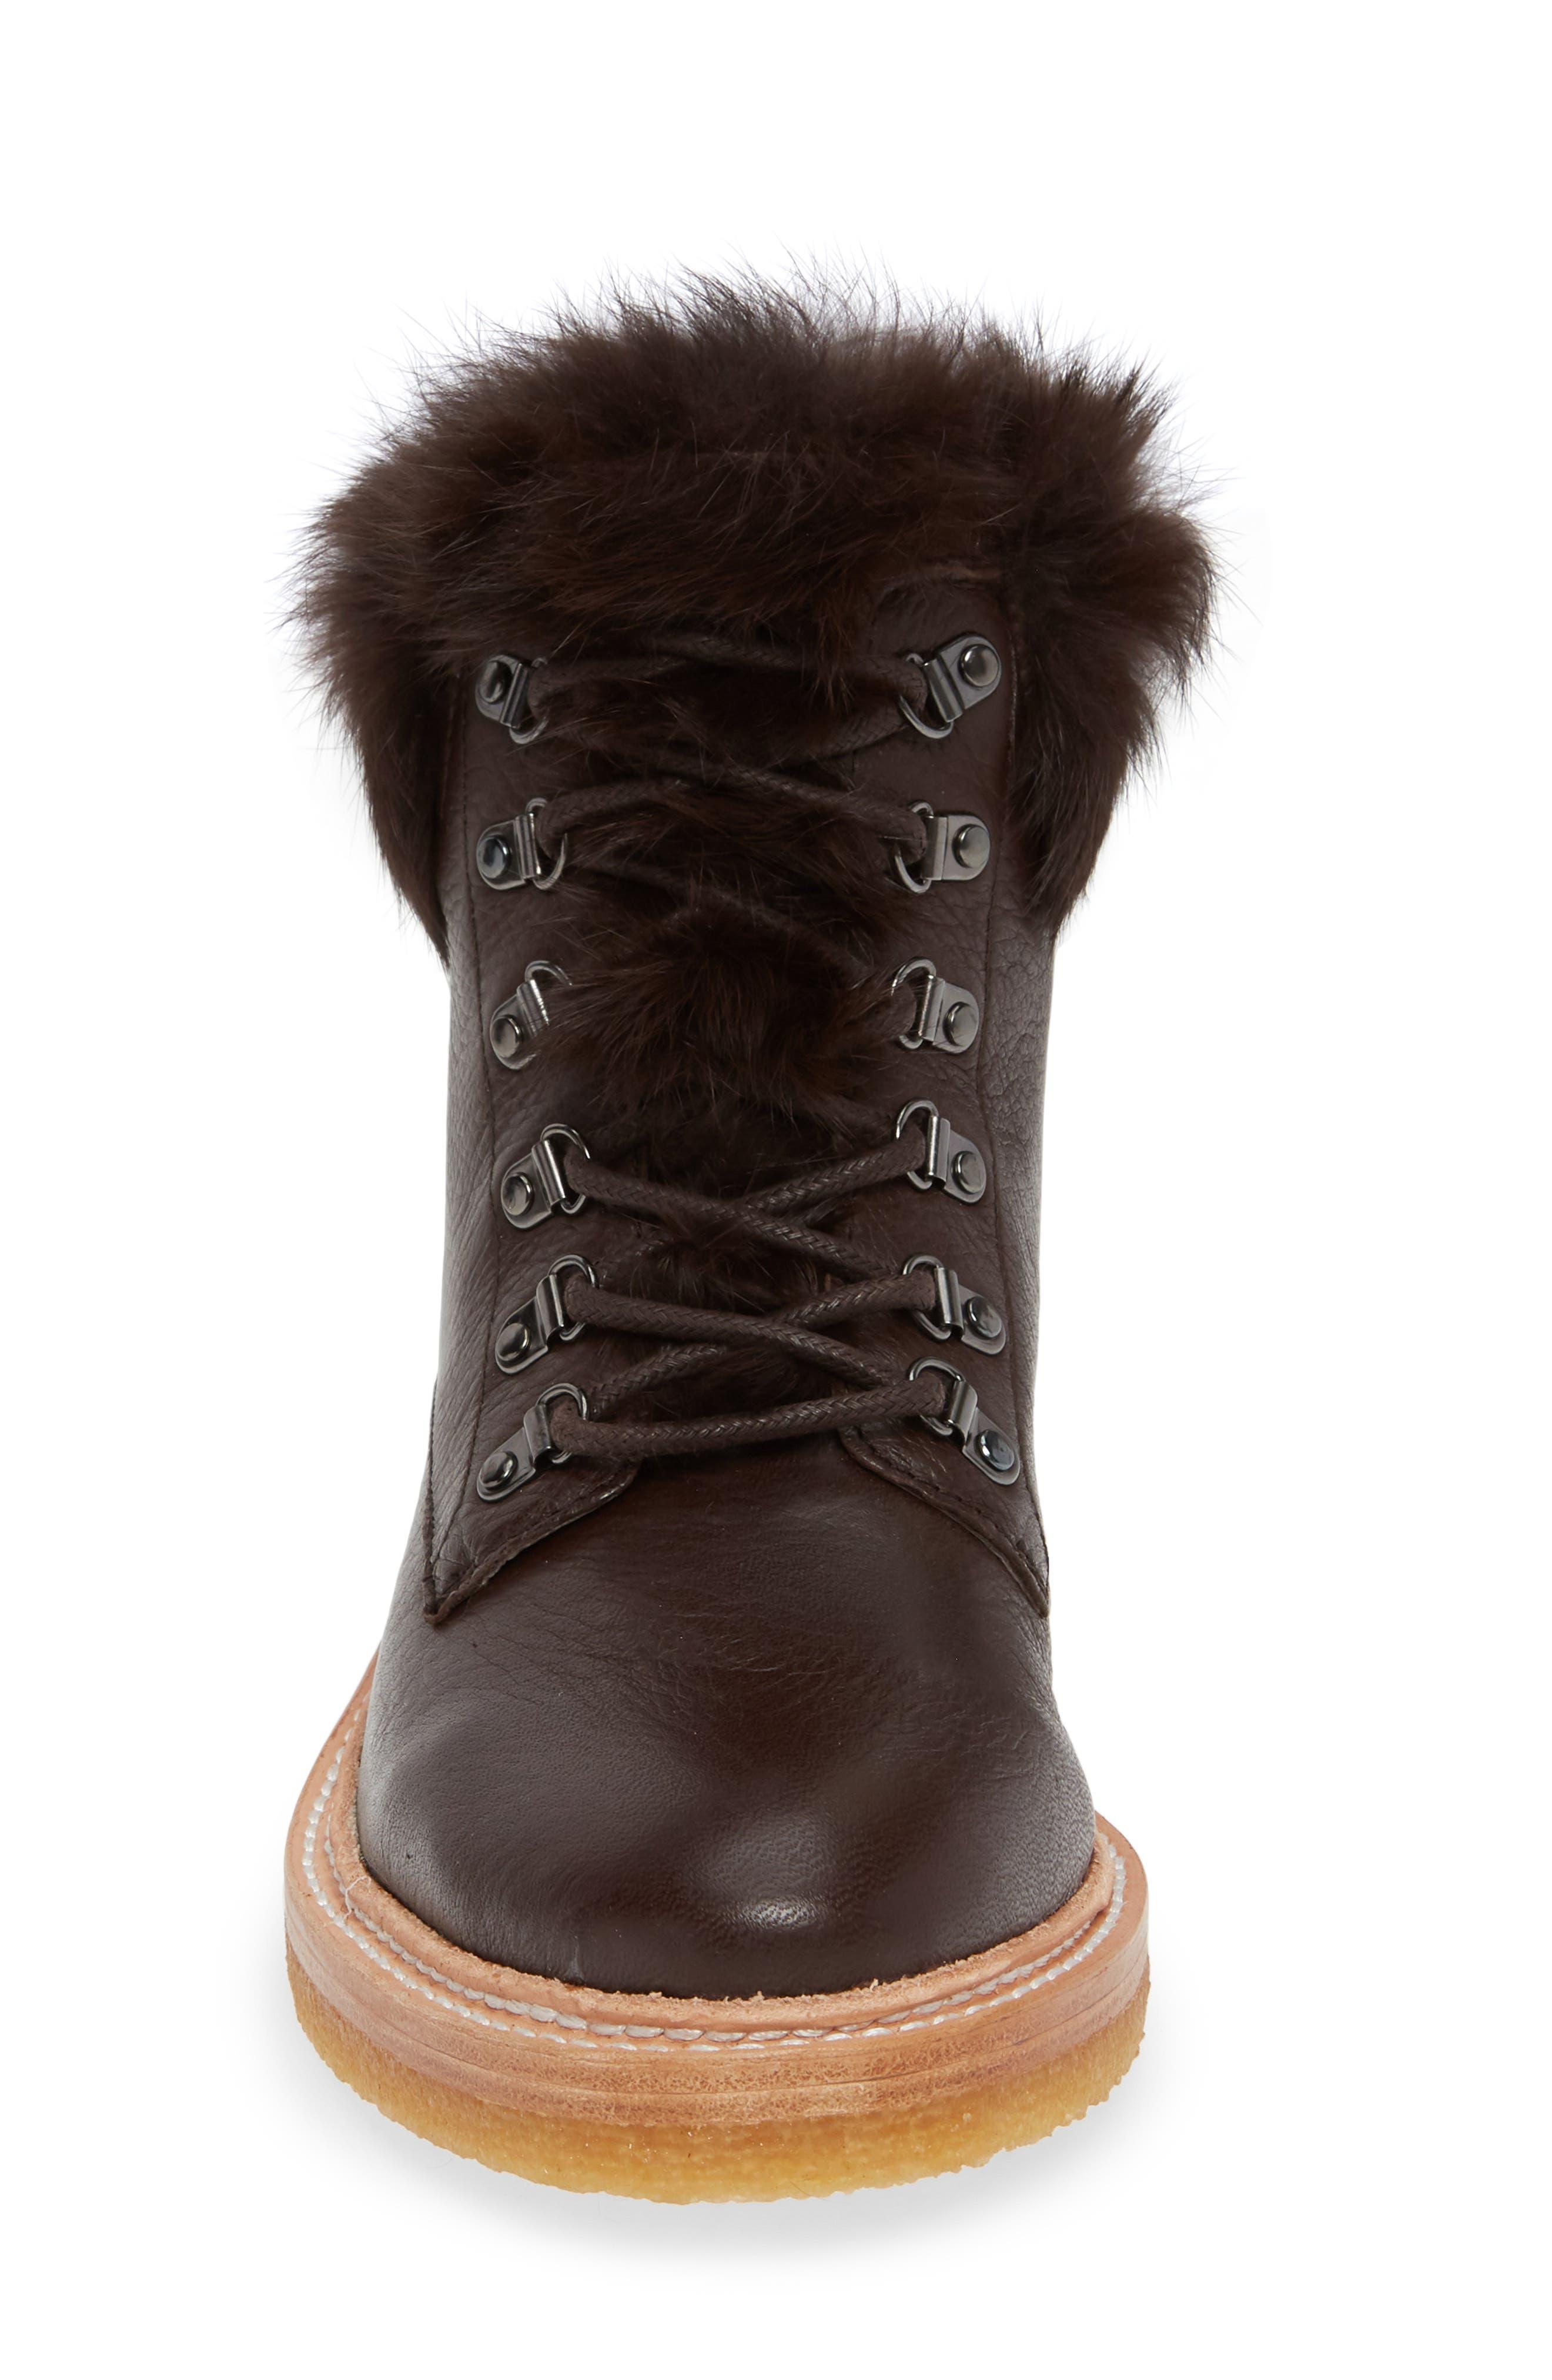 Winter Genuine Rabbit Fur Trim Boot,                             Alternate thumbnail 4, color,                             MOCHA LEATHER